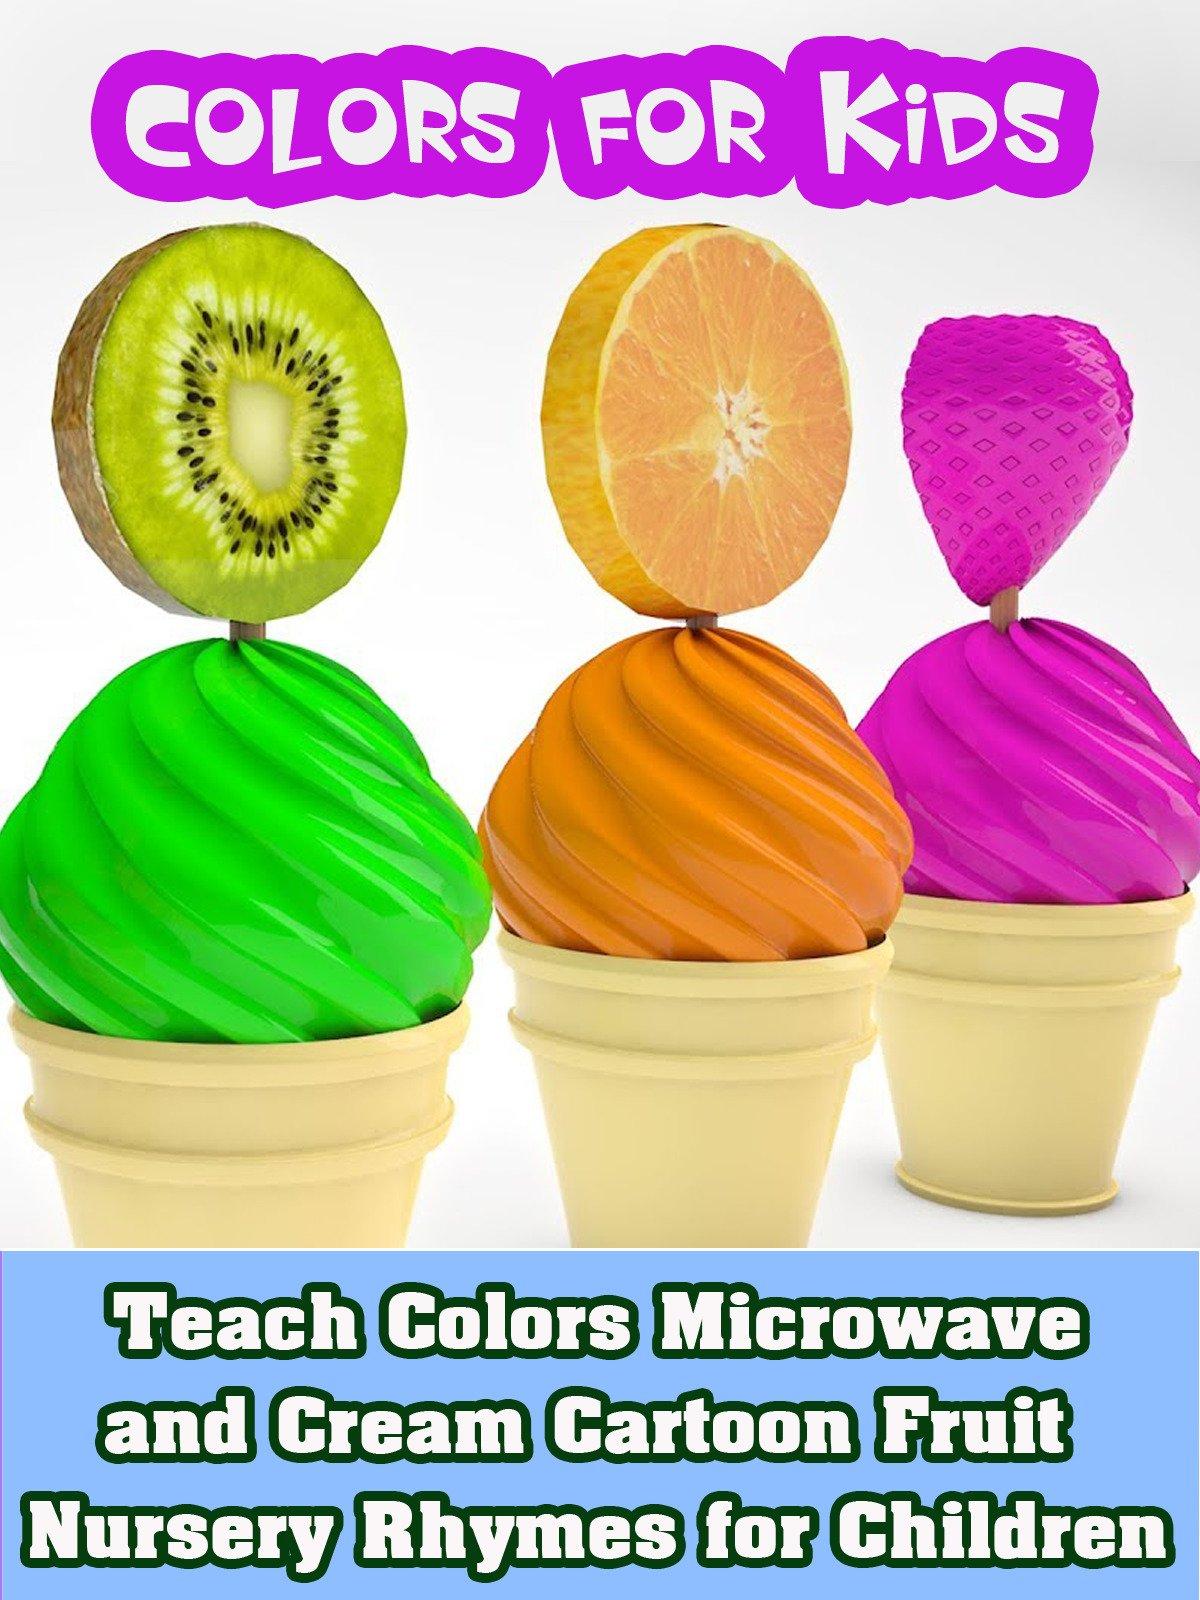 Teach Colors Microwave and Cream Cartoon Fruit Nursery Rhymes for Children